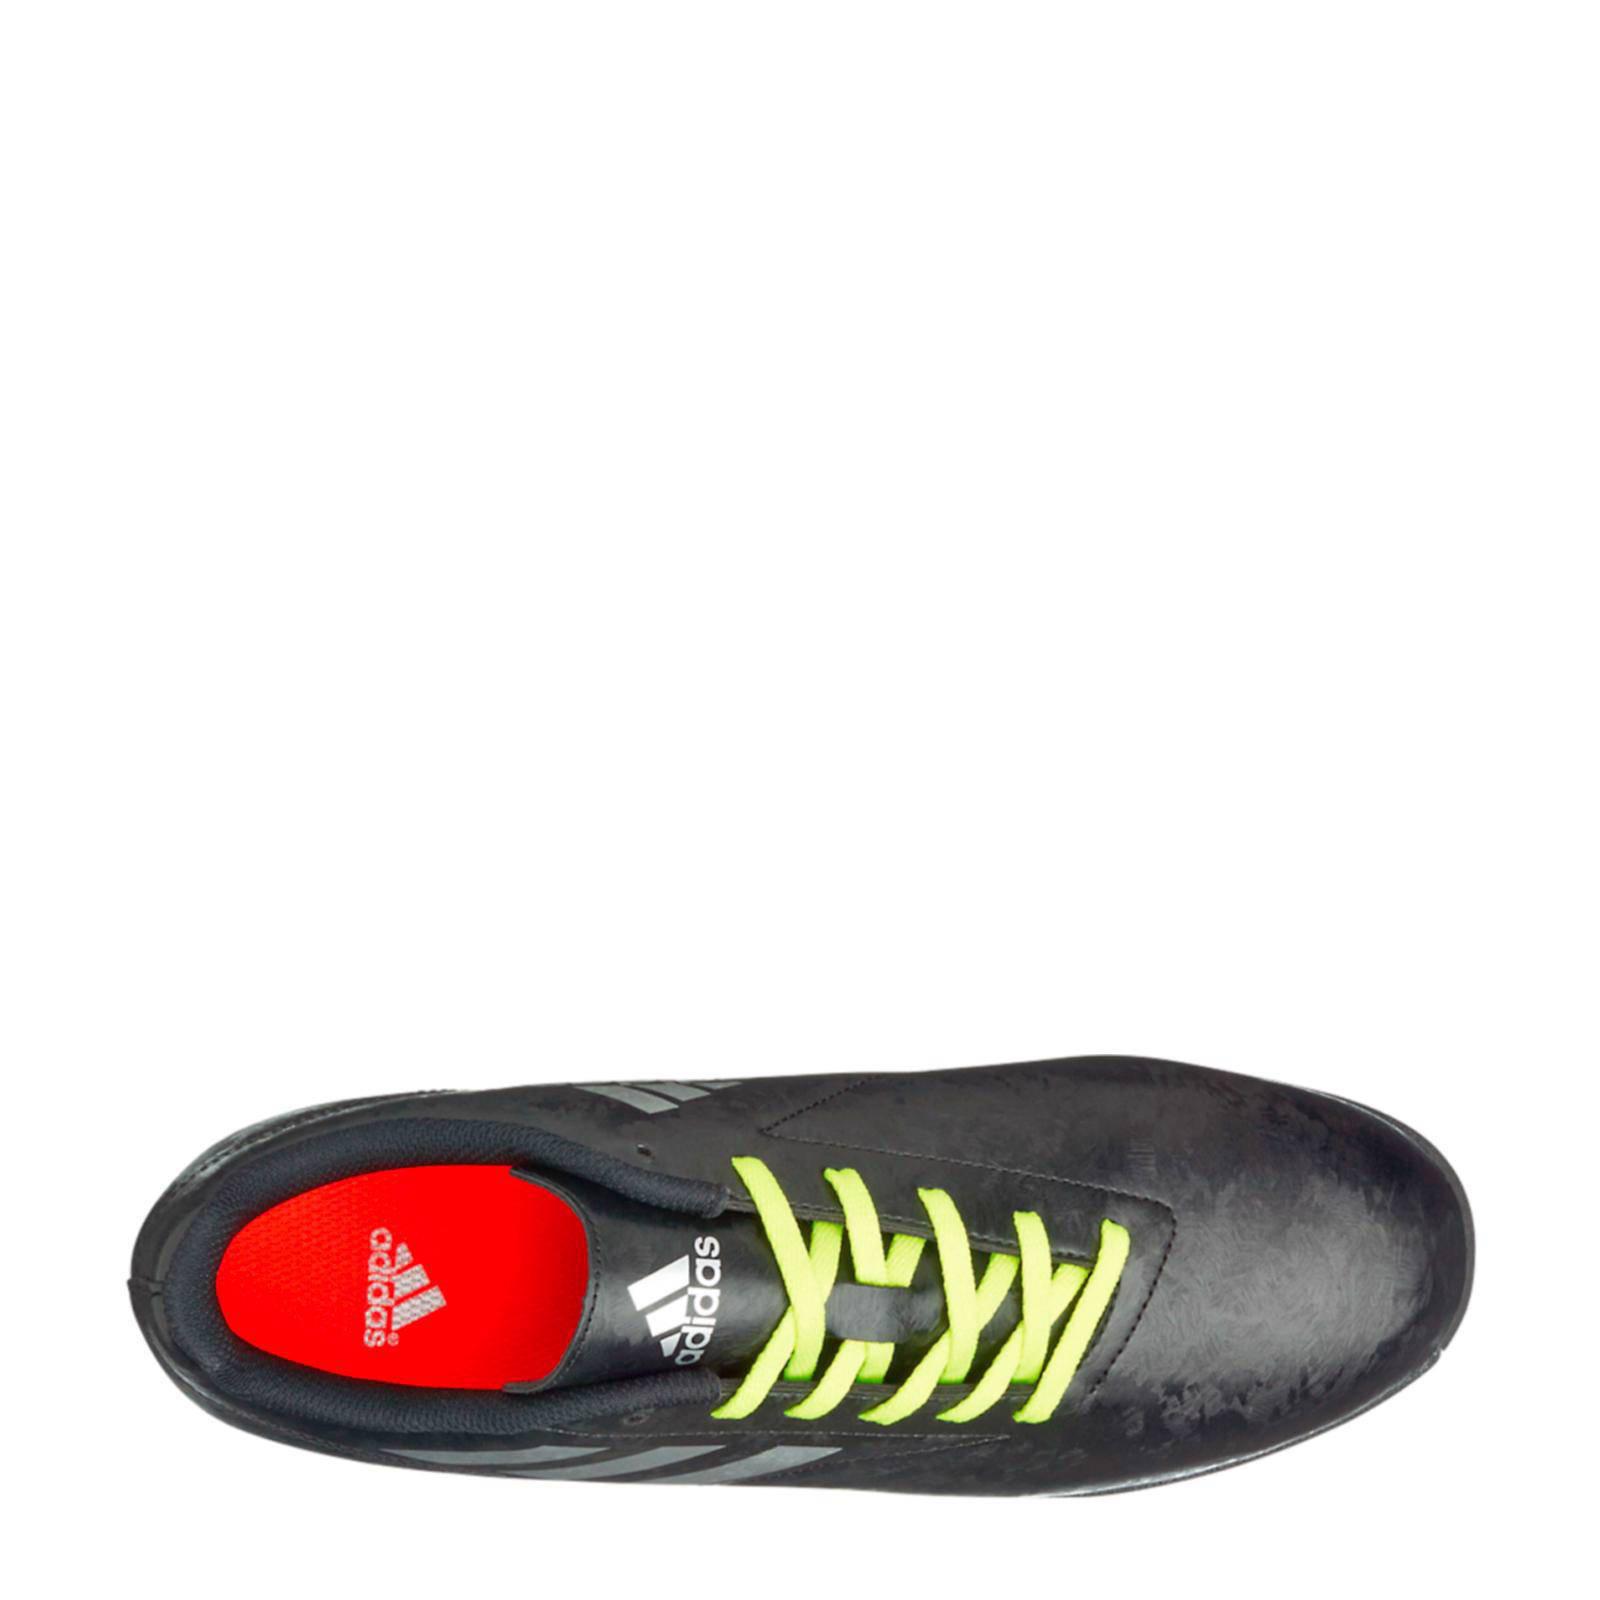 adidas performance heren Conquisto kunstgras voetbalschoenen